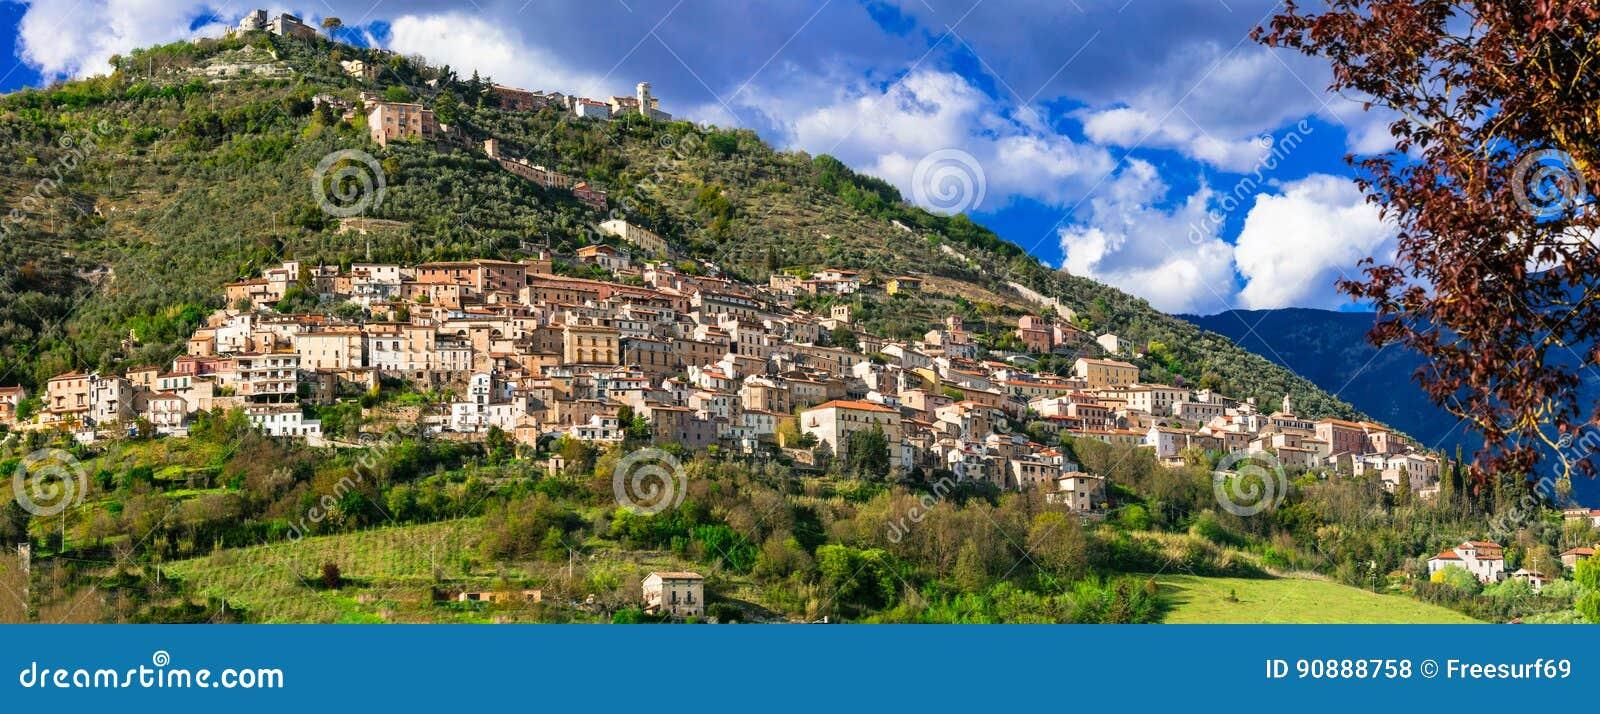 Alvito - beau village médiéval dans la province de Frosinone, Latium